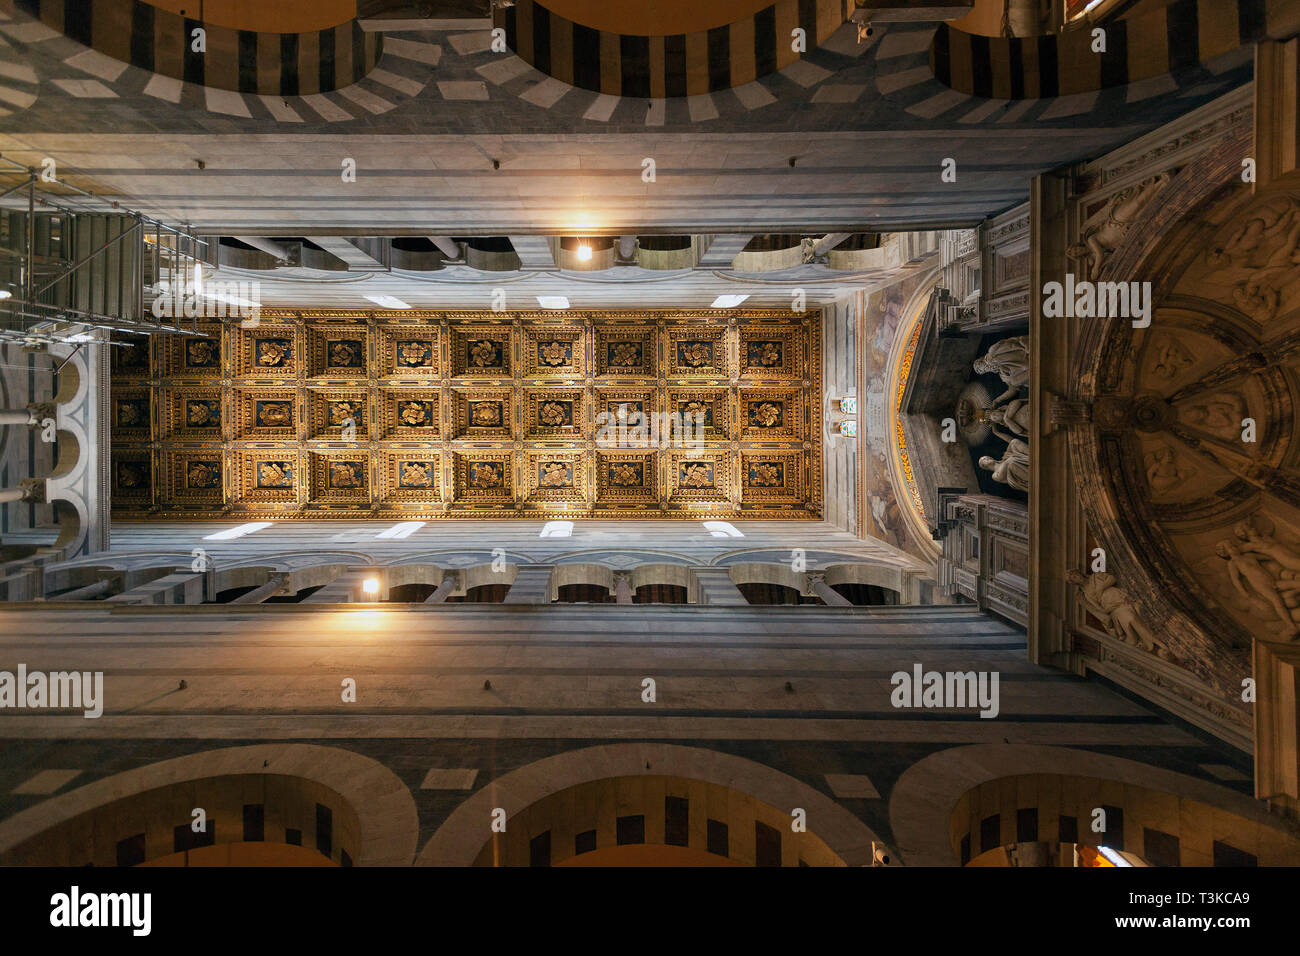 Interior of Pisa Cathedral Stock Photo